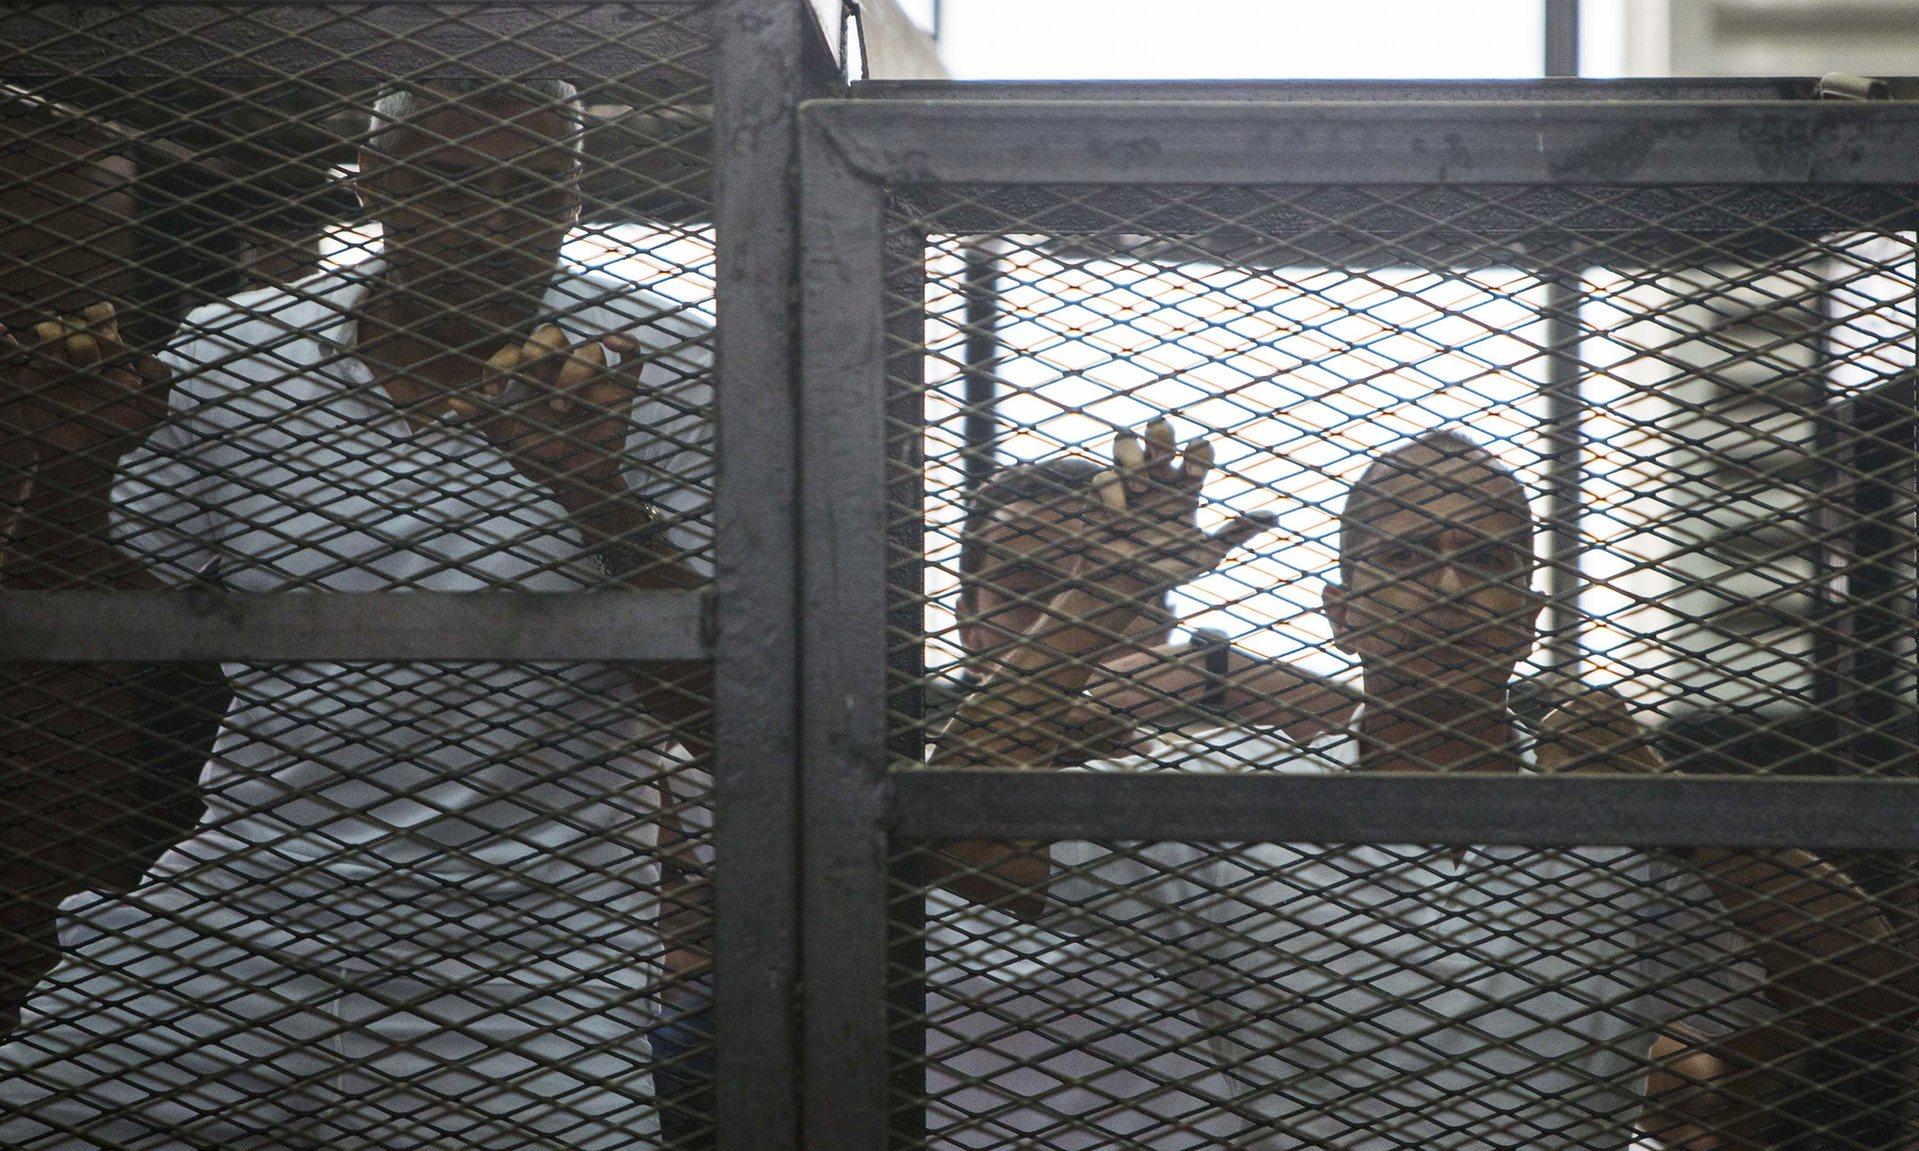 egyipt_journalists.jpg